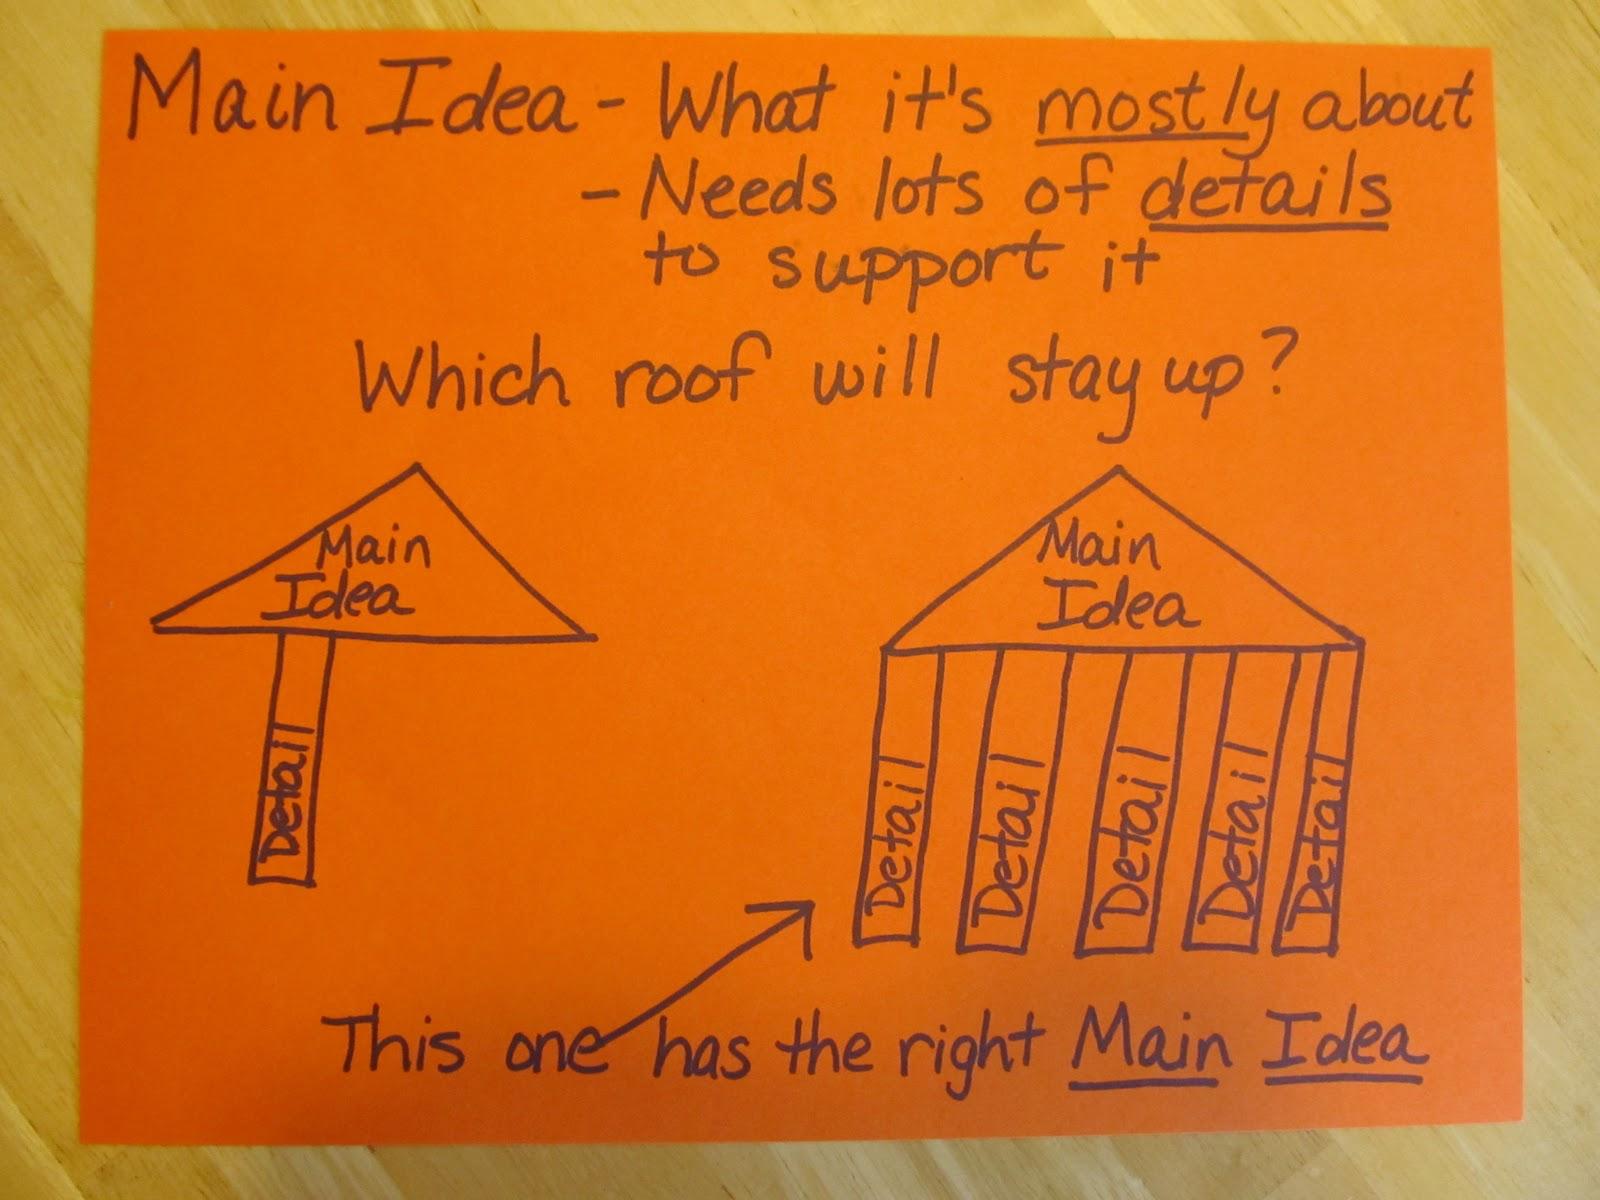 Sub Hub A Hands On Way Of Teaching Main Idea